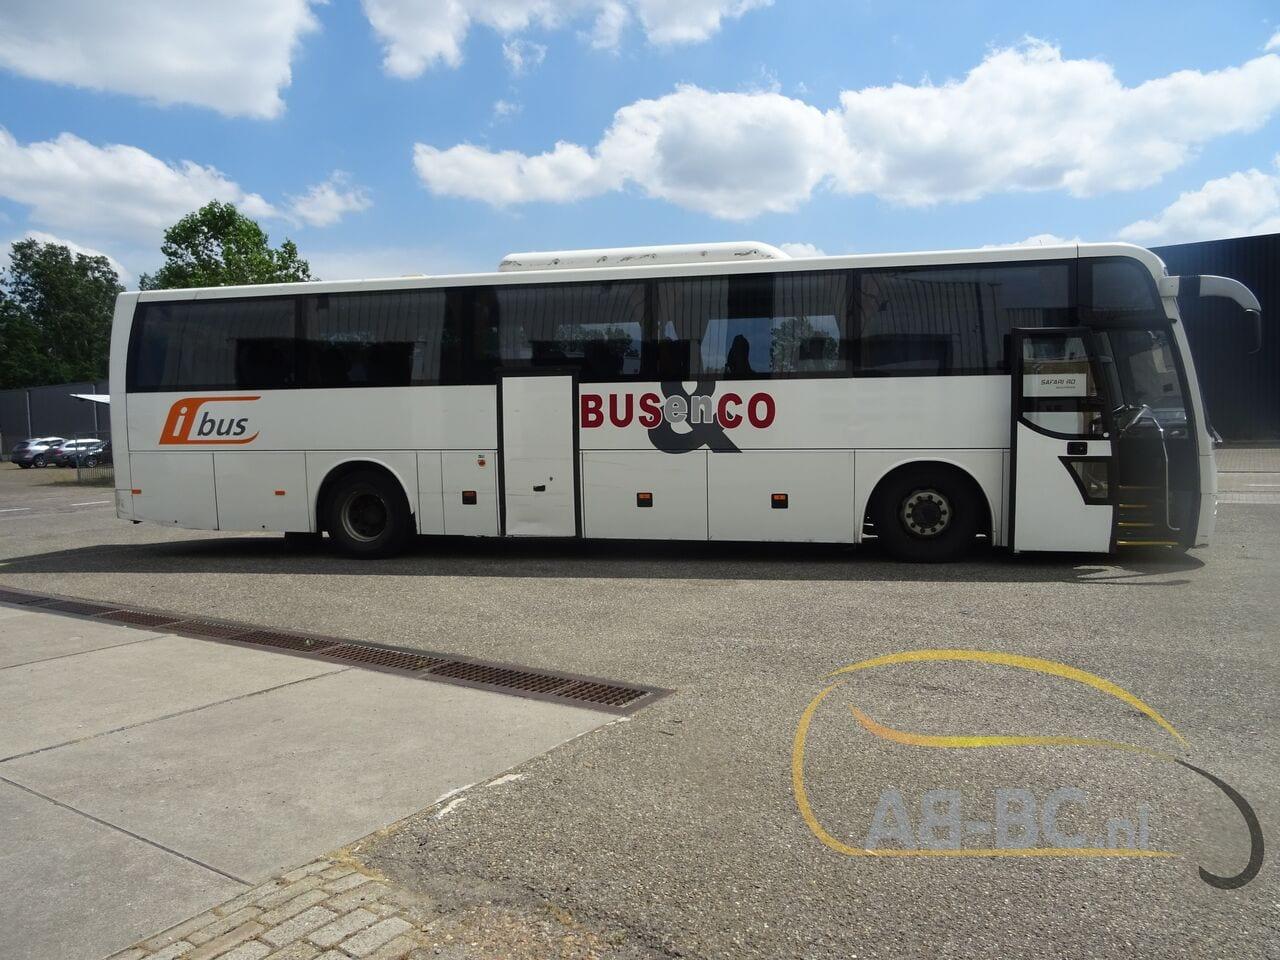 coach-busTEMSA-Safari-RD-DAF-Motor-53-Seats-Euro-5---1623932780536776604_big_52952a3859fee3d03352084c7202940f--21061715155620919600